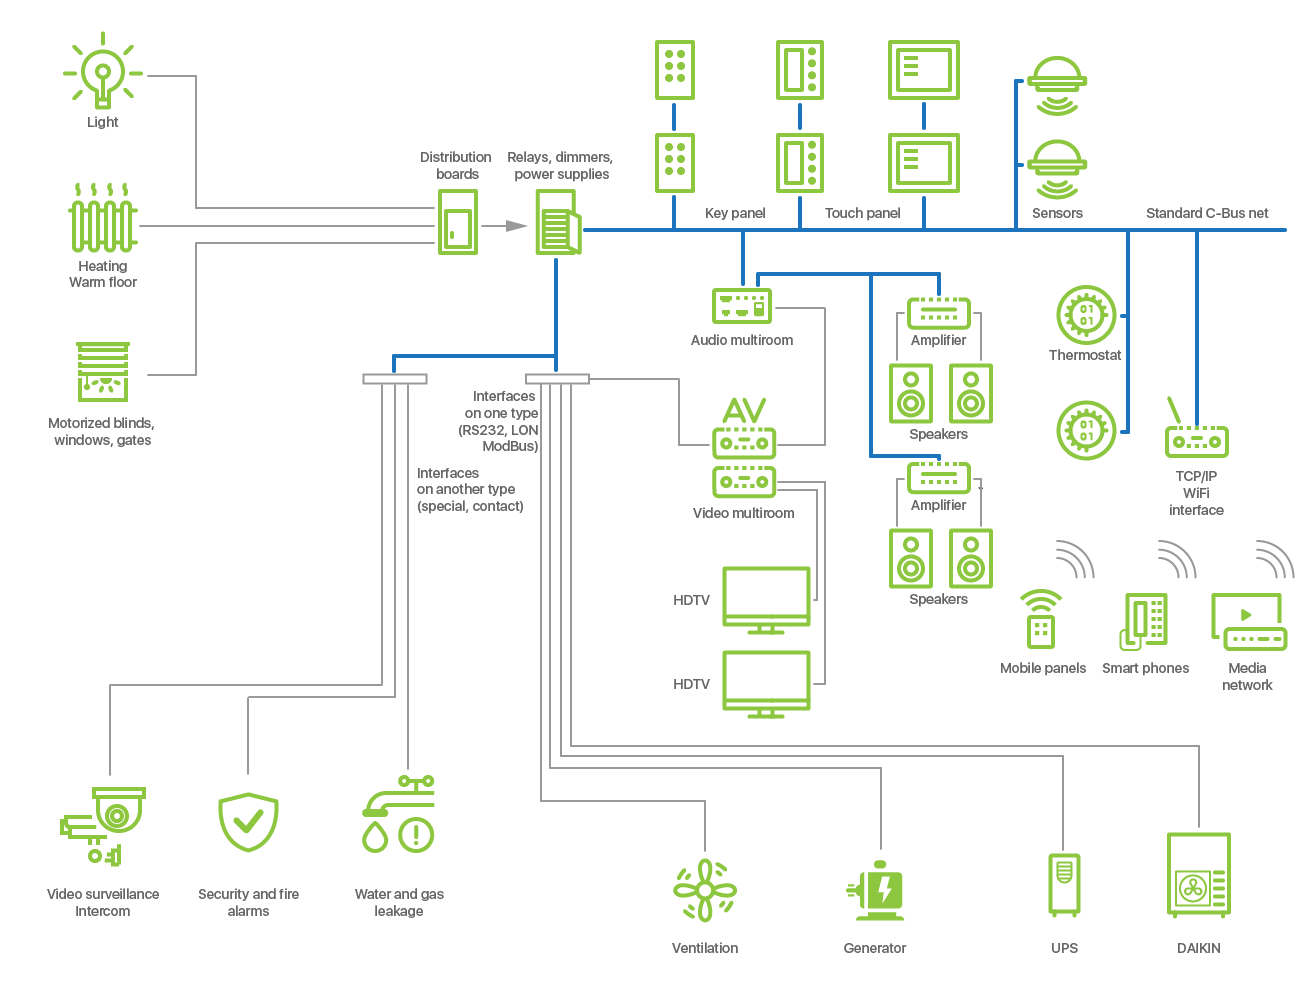 iRidium pro: Gateway between Devices | Блог iRidium mobile